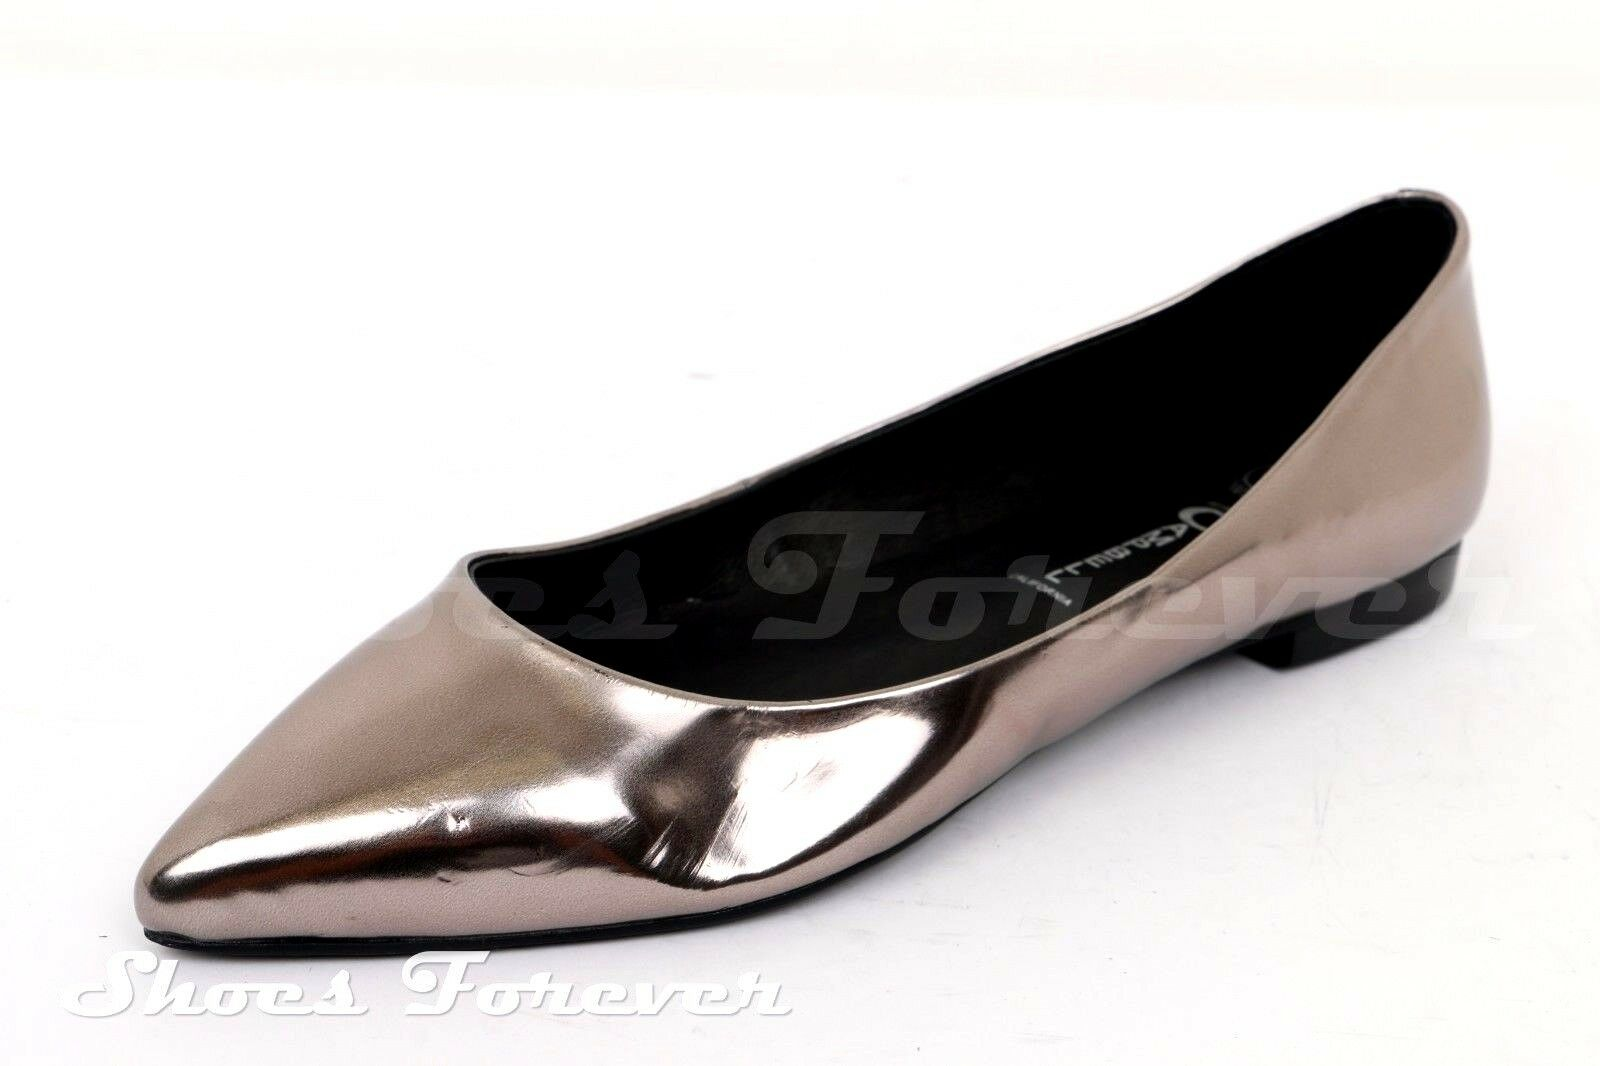 Donna JEFFREY CAMPBELL CAMPBELL JEFFREY pewter Metallic Ballet Flats